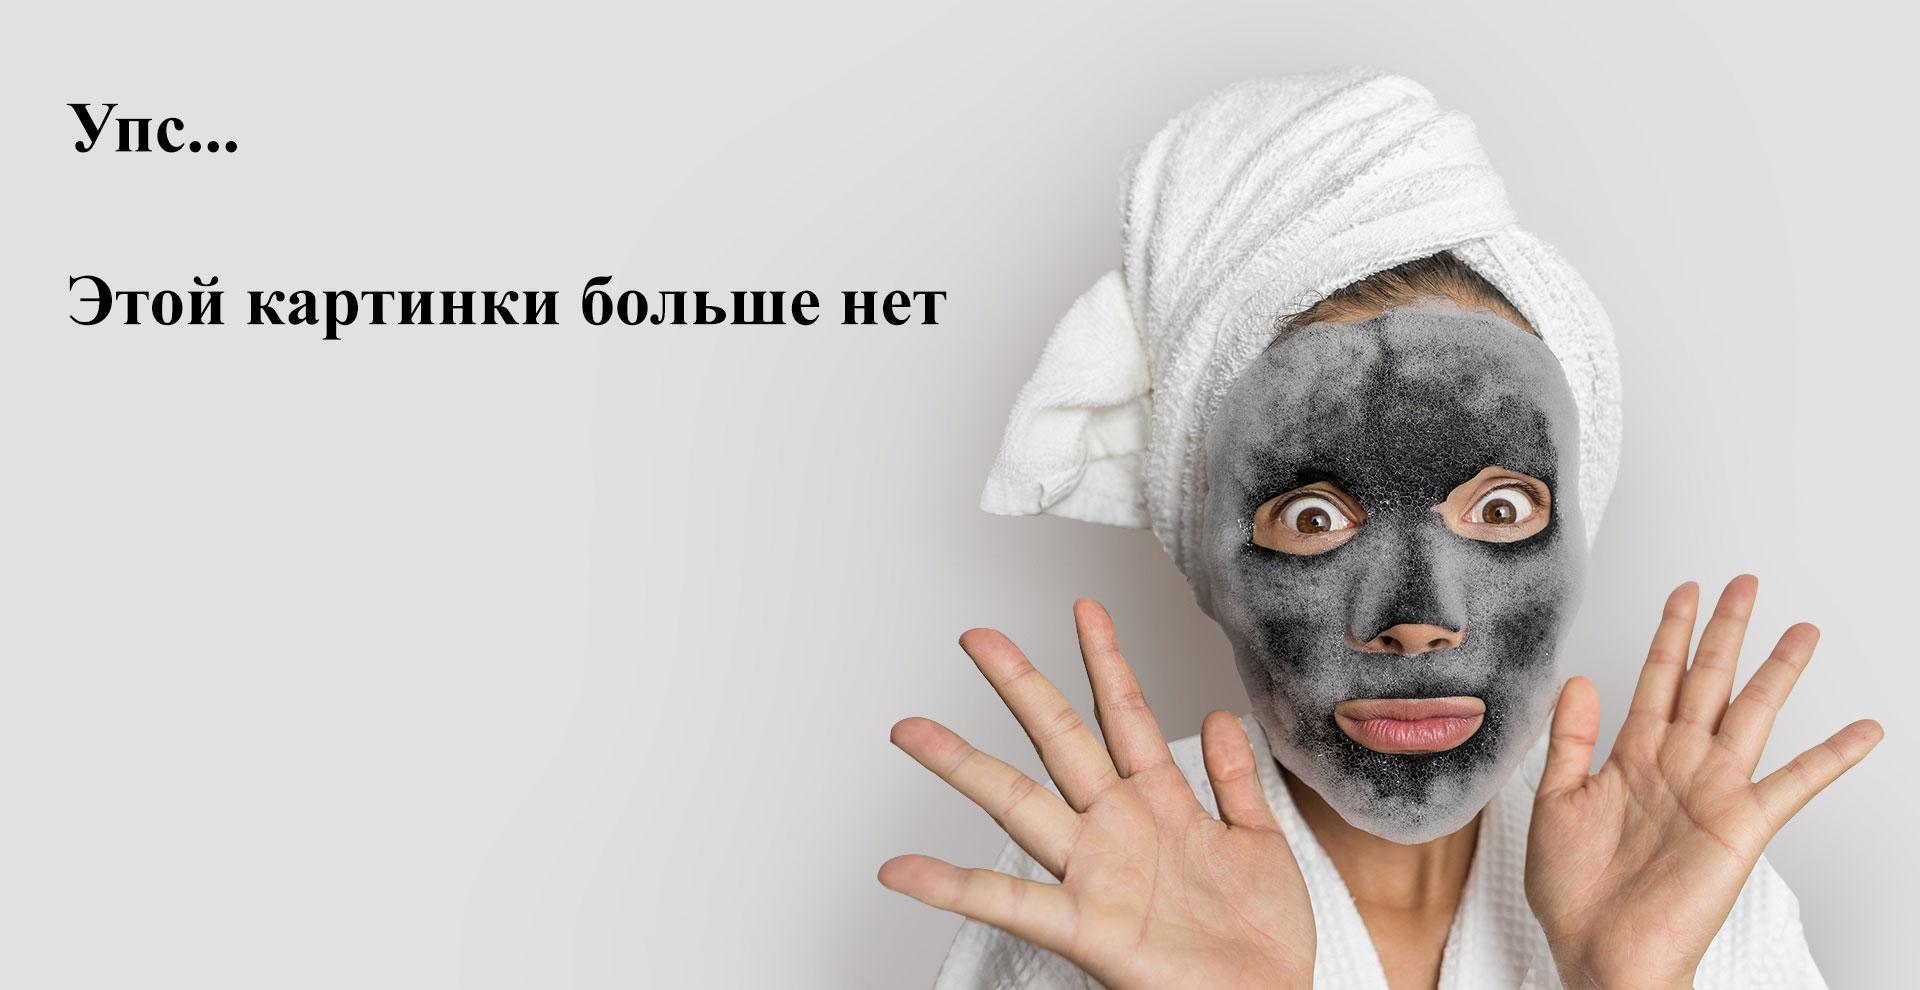 Siberina, Зубная паста «Лимон», 50 мл